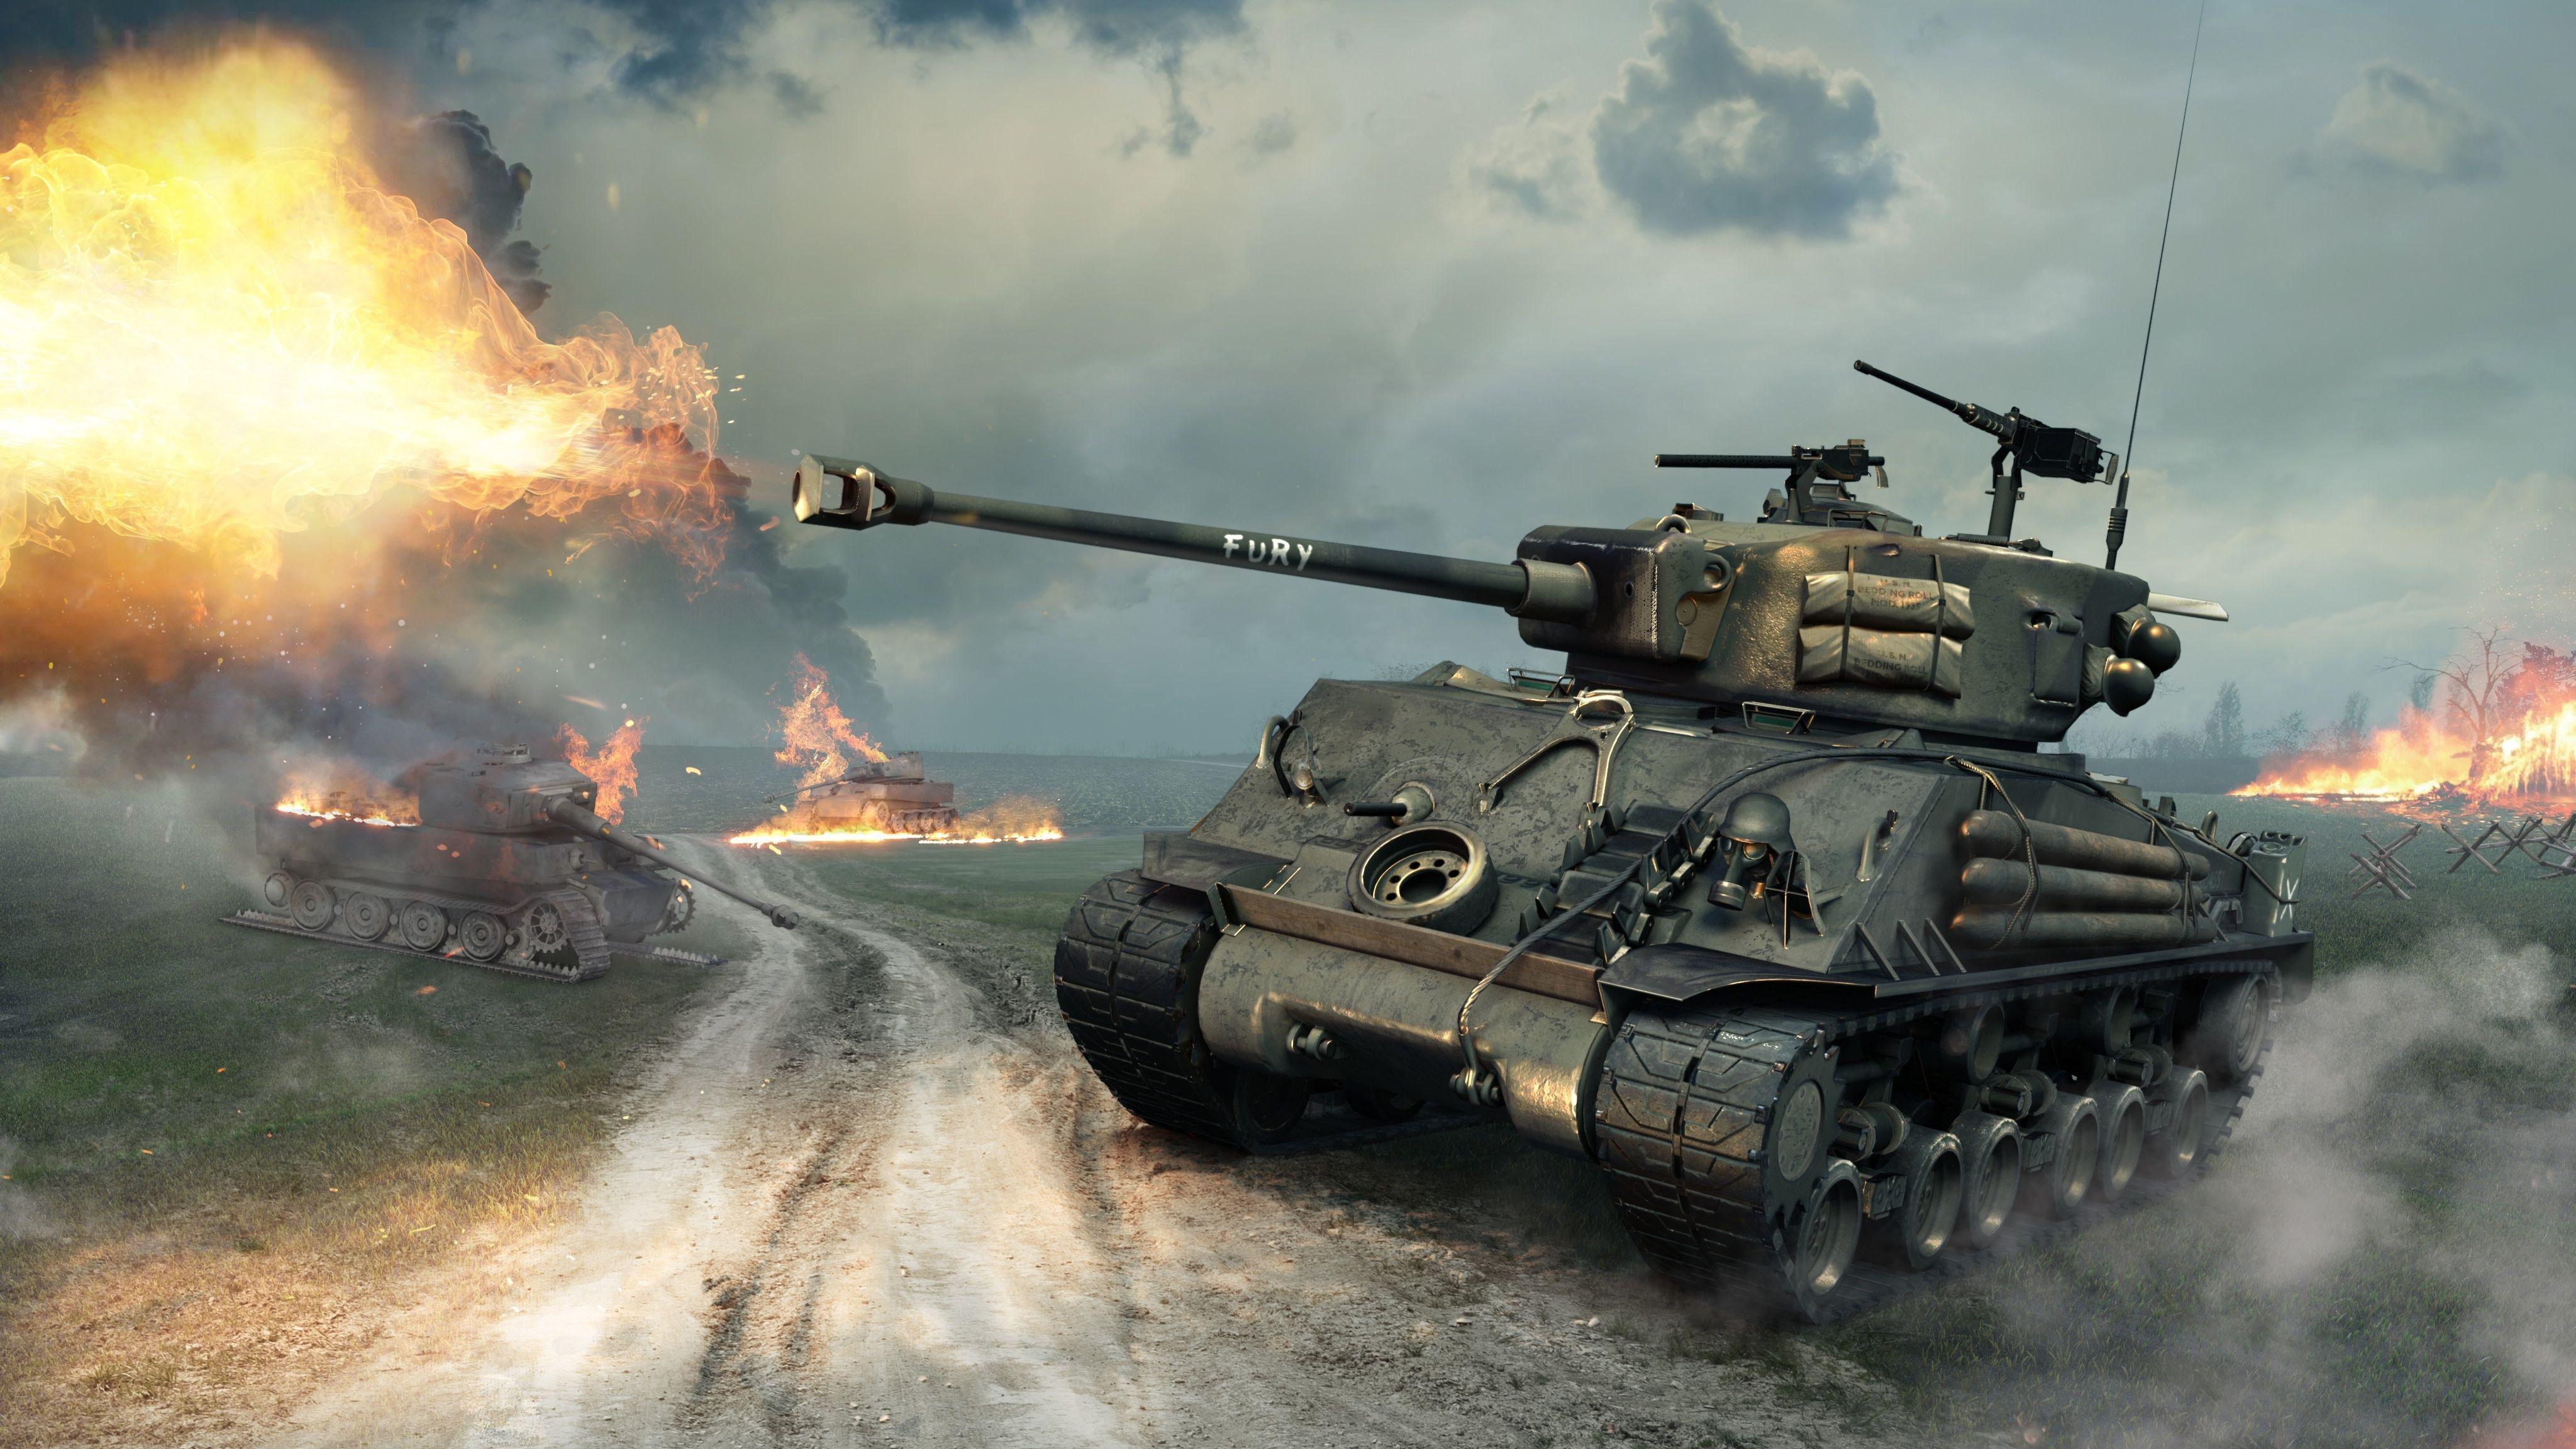 4096x2304 Wallpaper World Of Tanks World Of Tanks Xbox 360